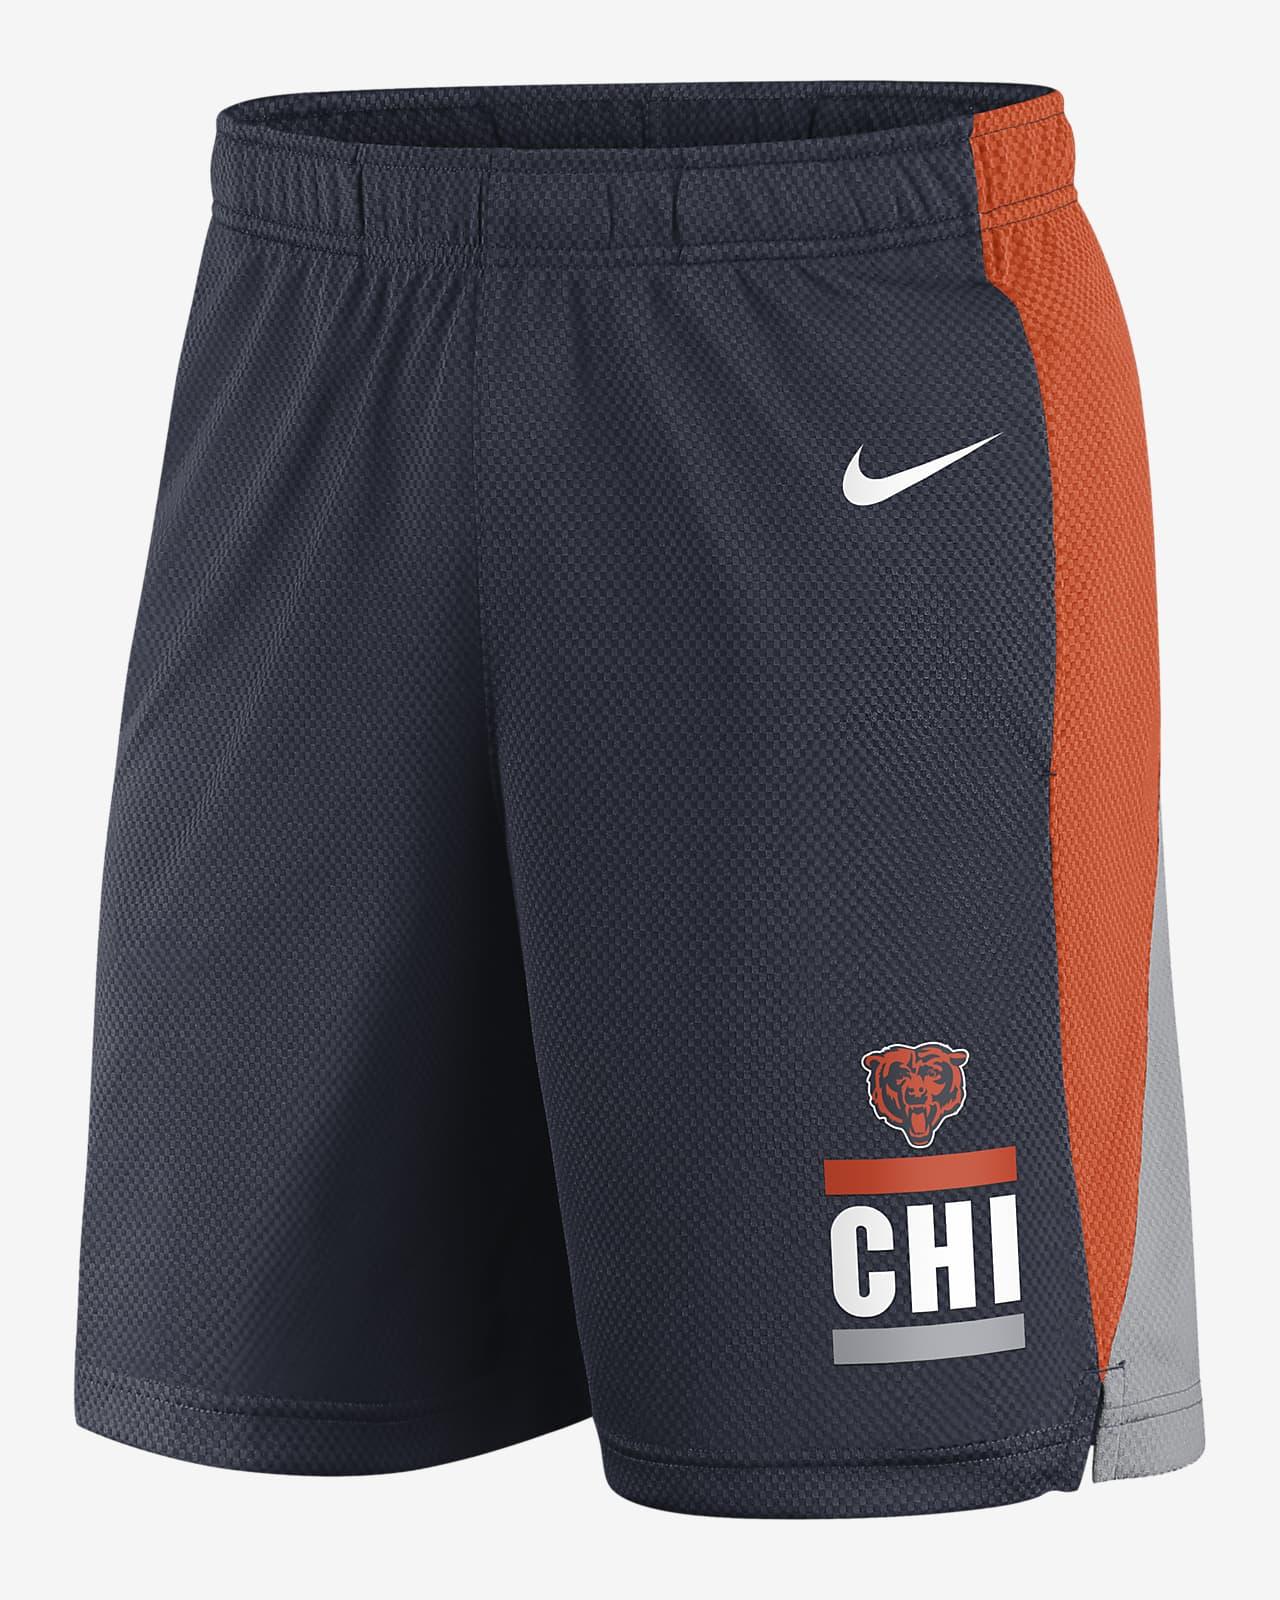 Nike Dri-FIT Broadcast (NFL Chicago Bears) Men's Shorts